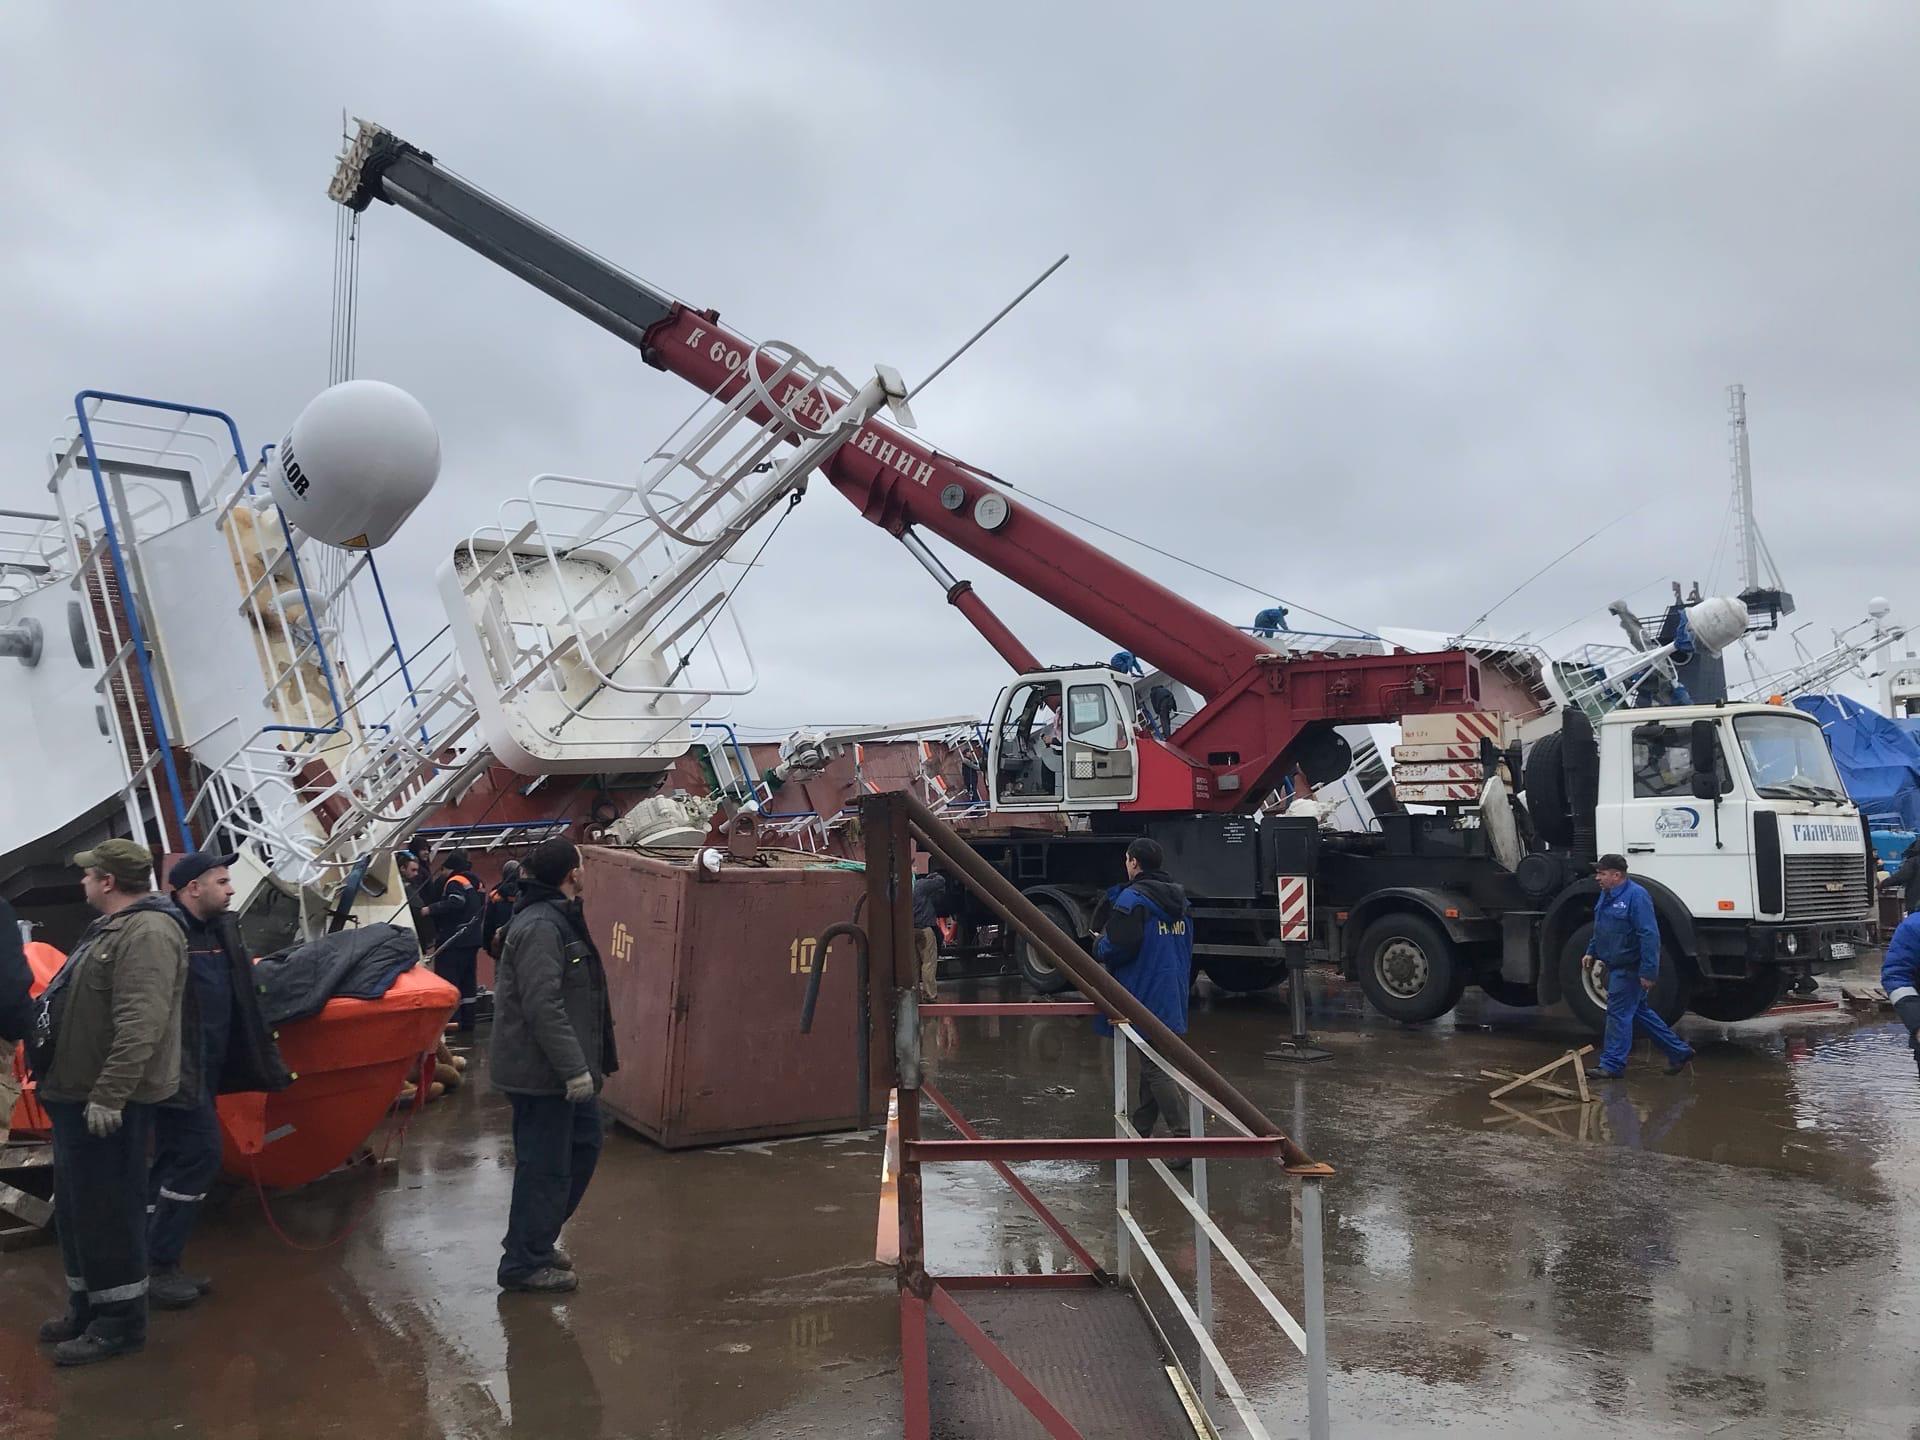 фото ЗакС политика СК и прокуратура занялись инцидентом с перевернувшимся судном в Ленобласти